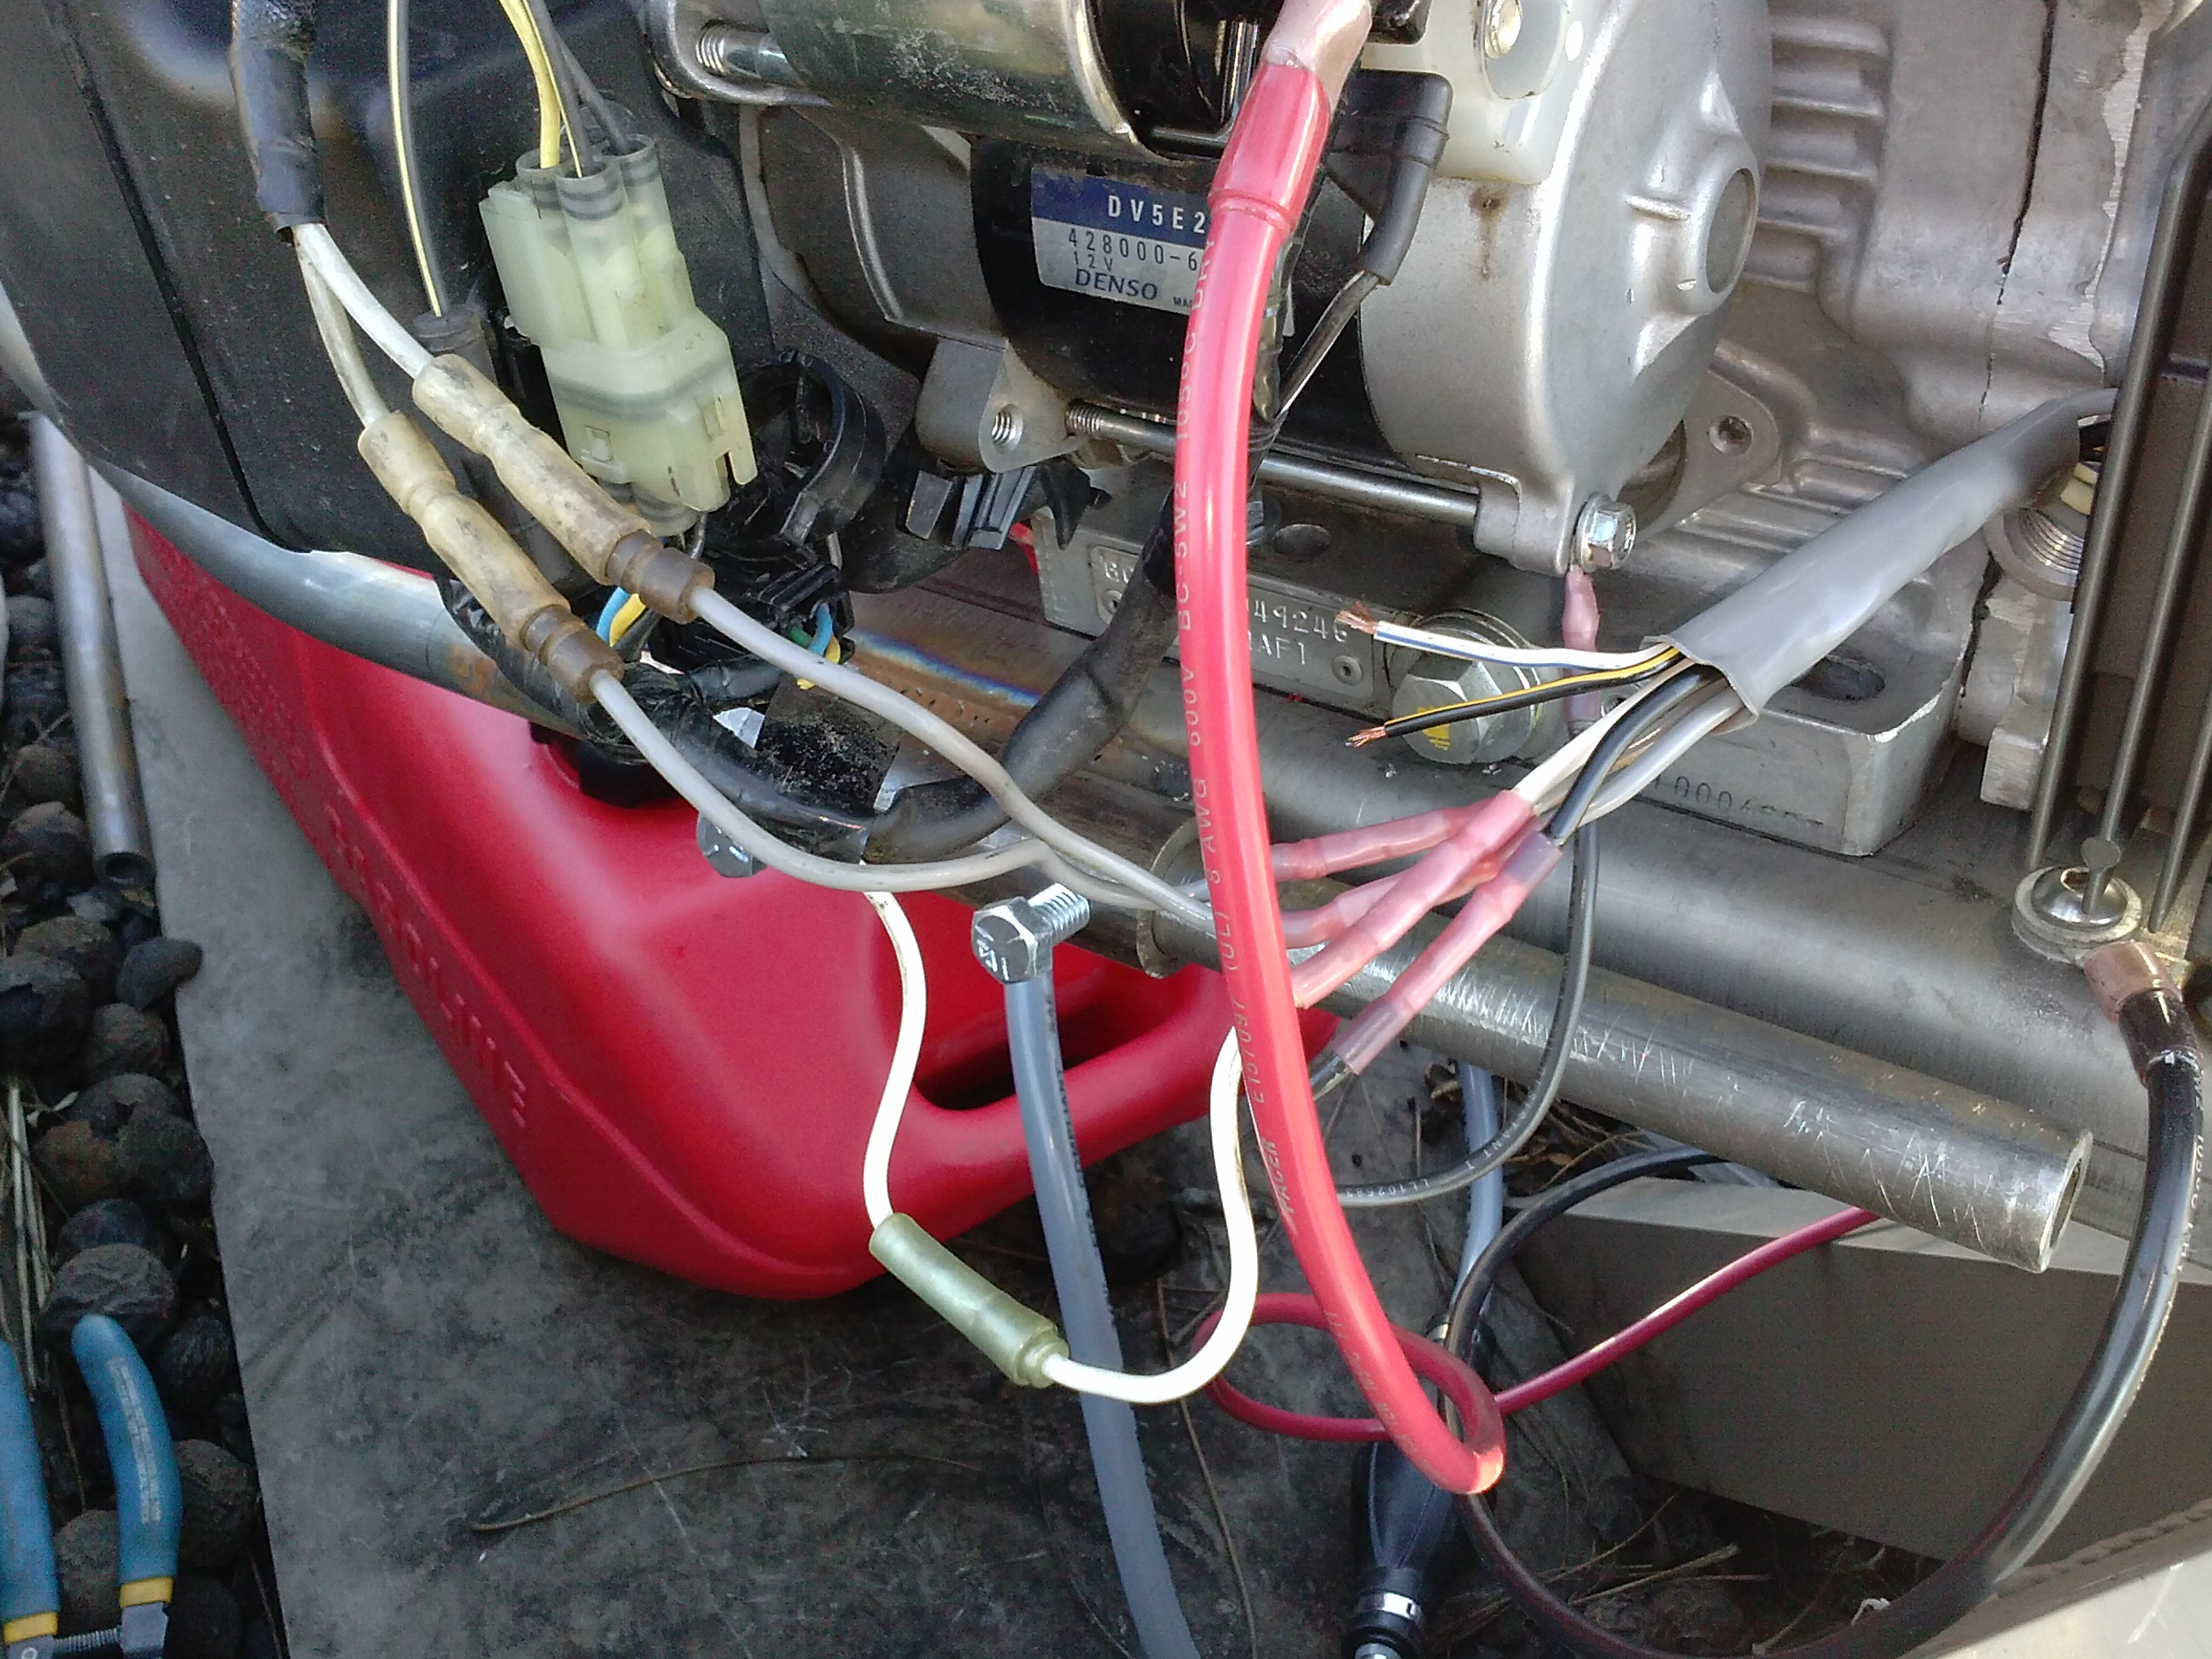 I Need Help Troubleshooting The Charging System On A Honda Gx630 - Honda Gx390 Electric Start Wiring Diagram